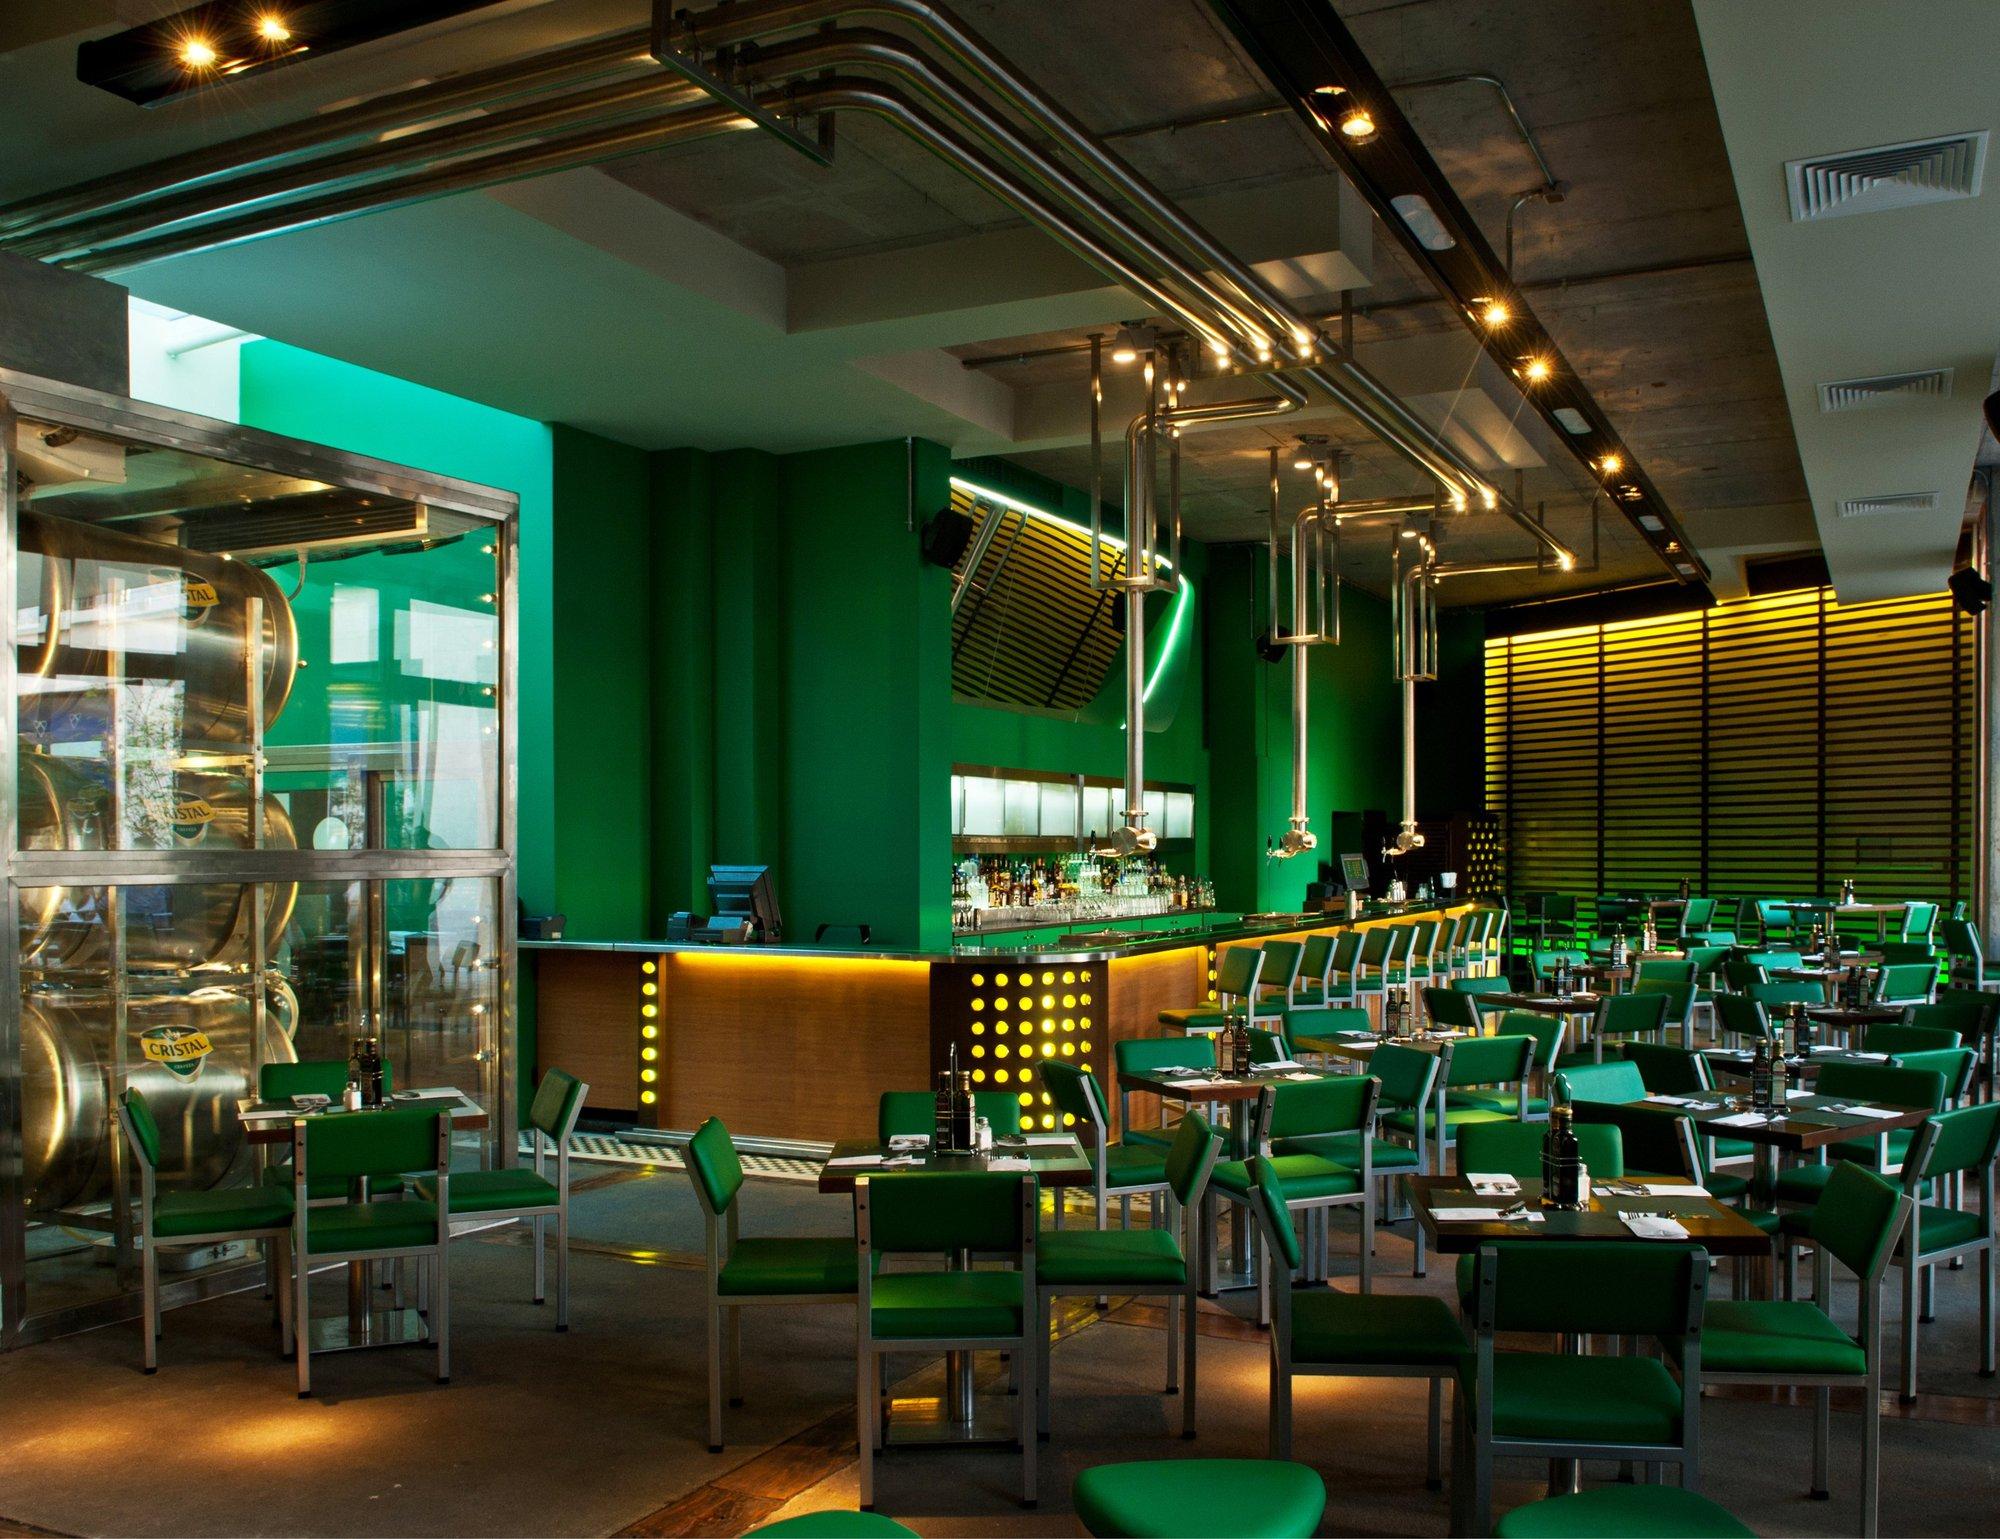 Galer a de proyecto iluminaci n bar la junta diav 7 - Barras de bar iluminadas ...